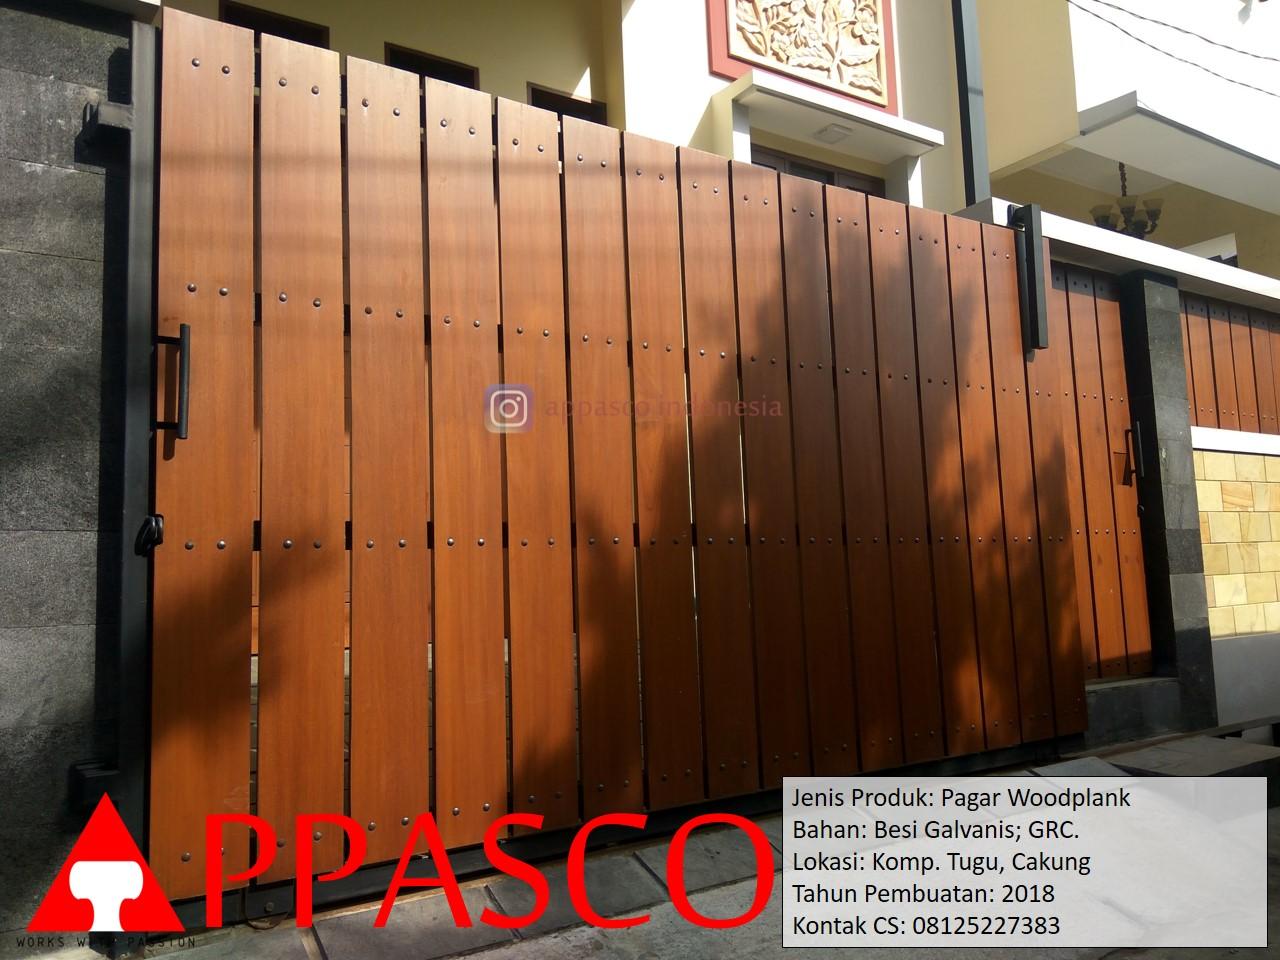 Pagar Minimalis Woodplank Besi Galvanis Motif Kayu GRC Di Tugu Cakung -  Jual Kanopi Tralis